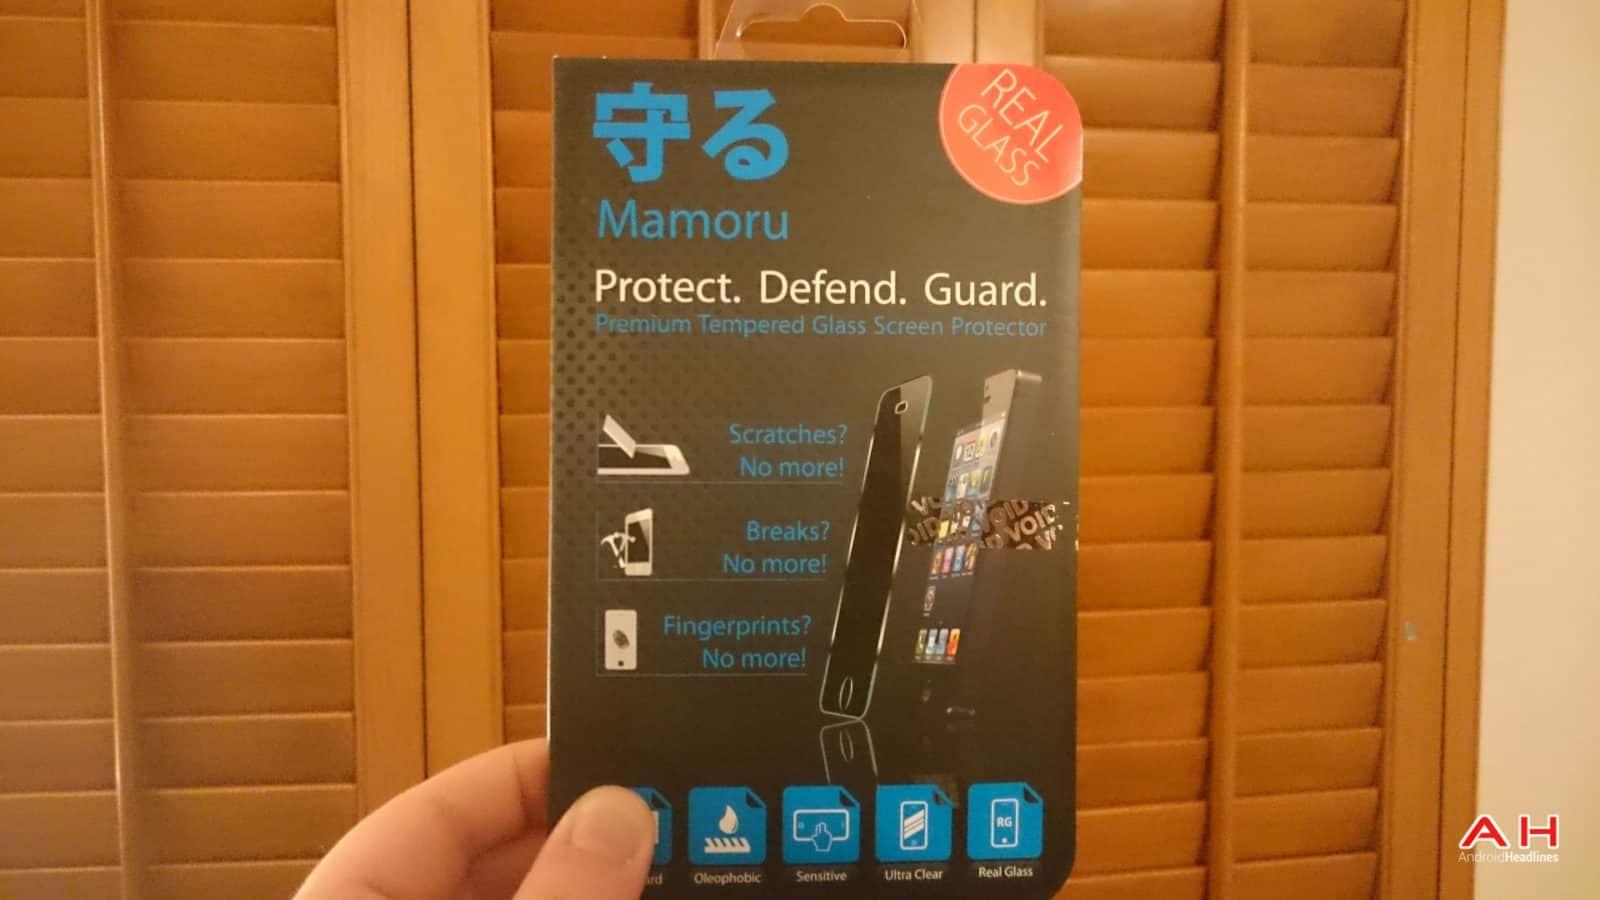 AH Mamoru Tempered Glass Screen Protector Z3-5